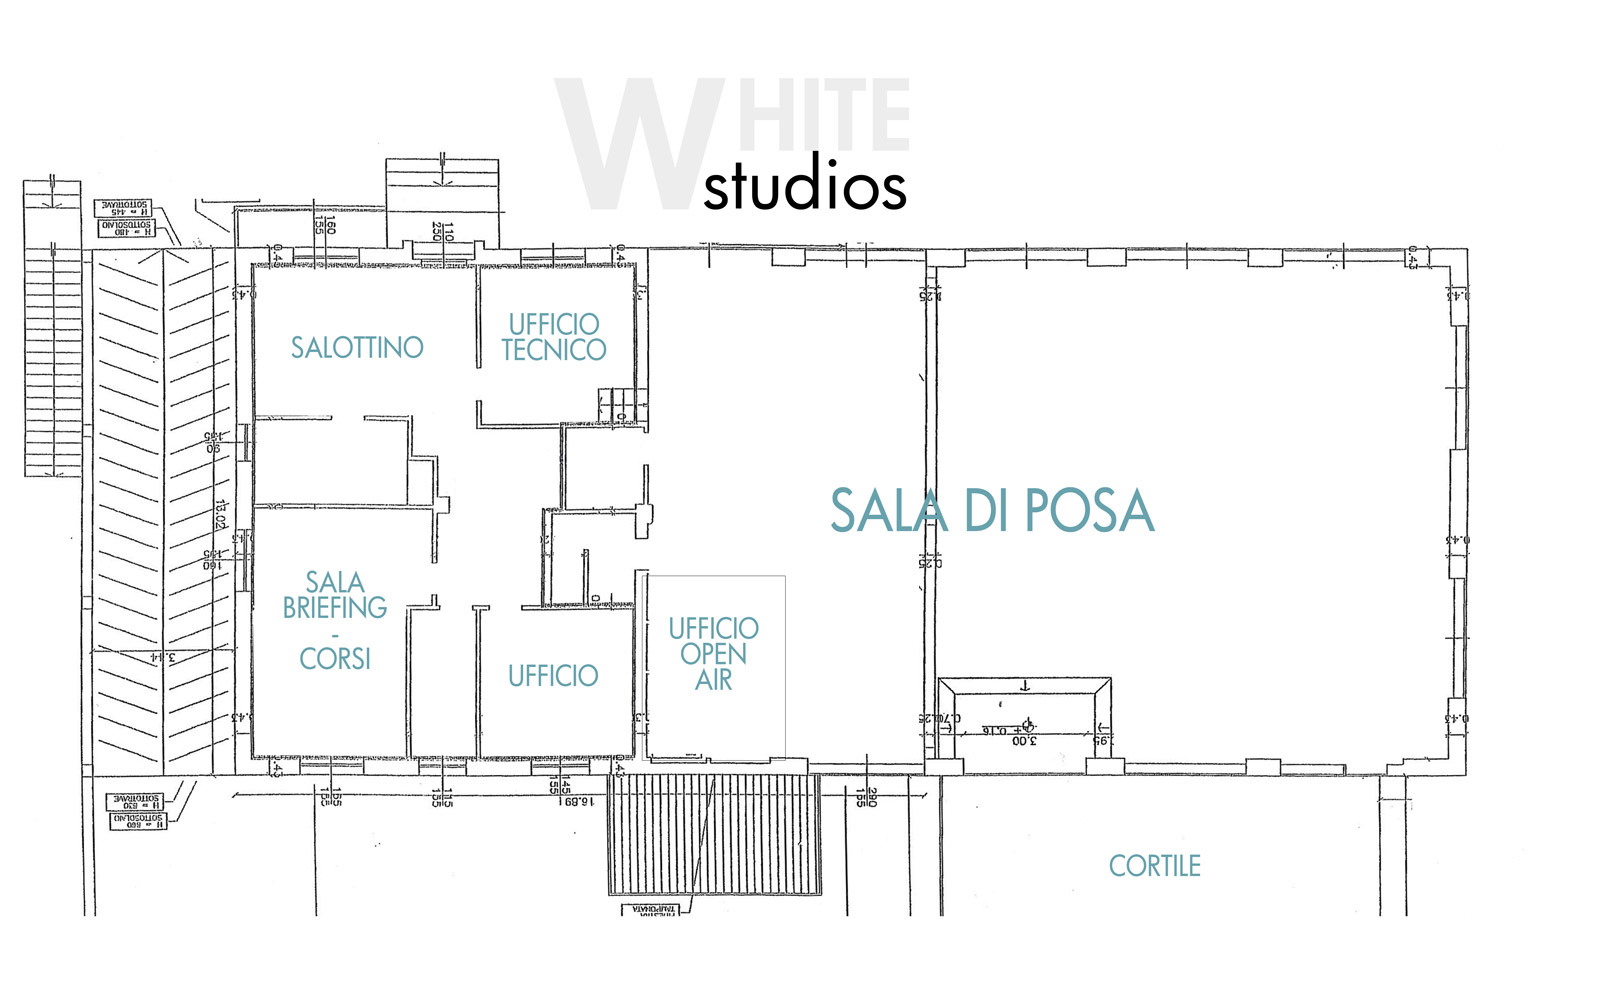 WHITE studios pianta